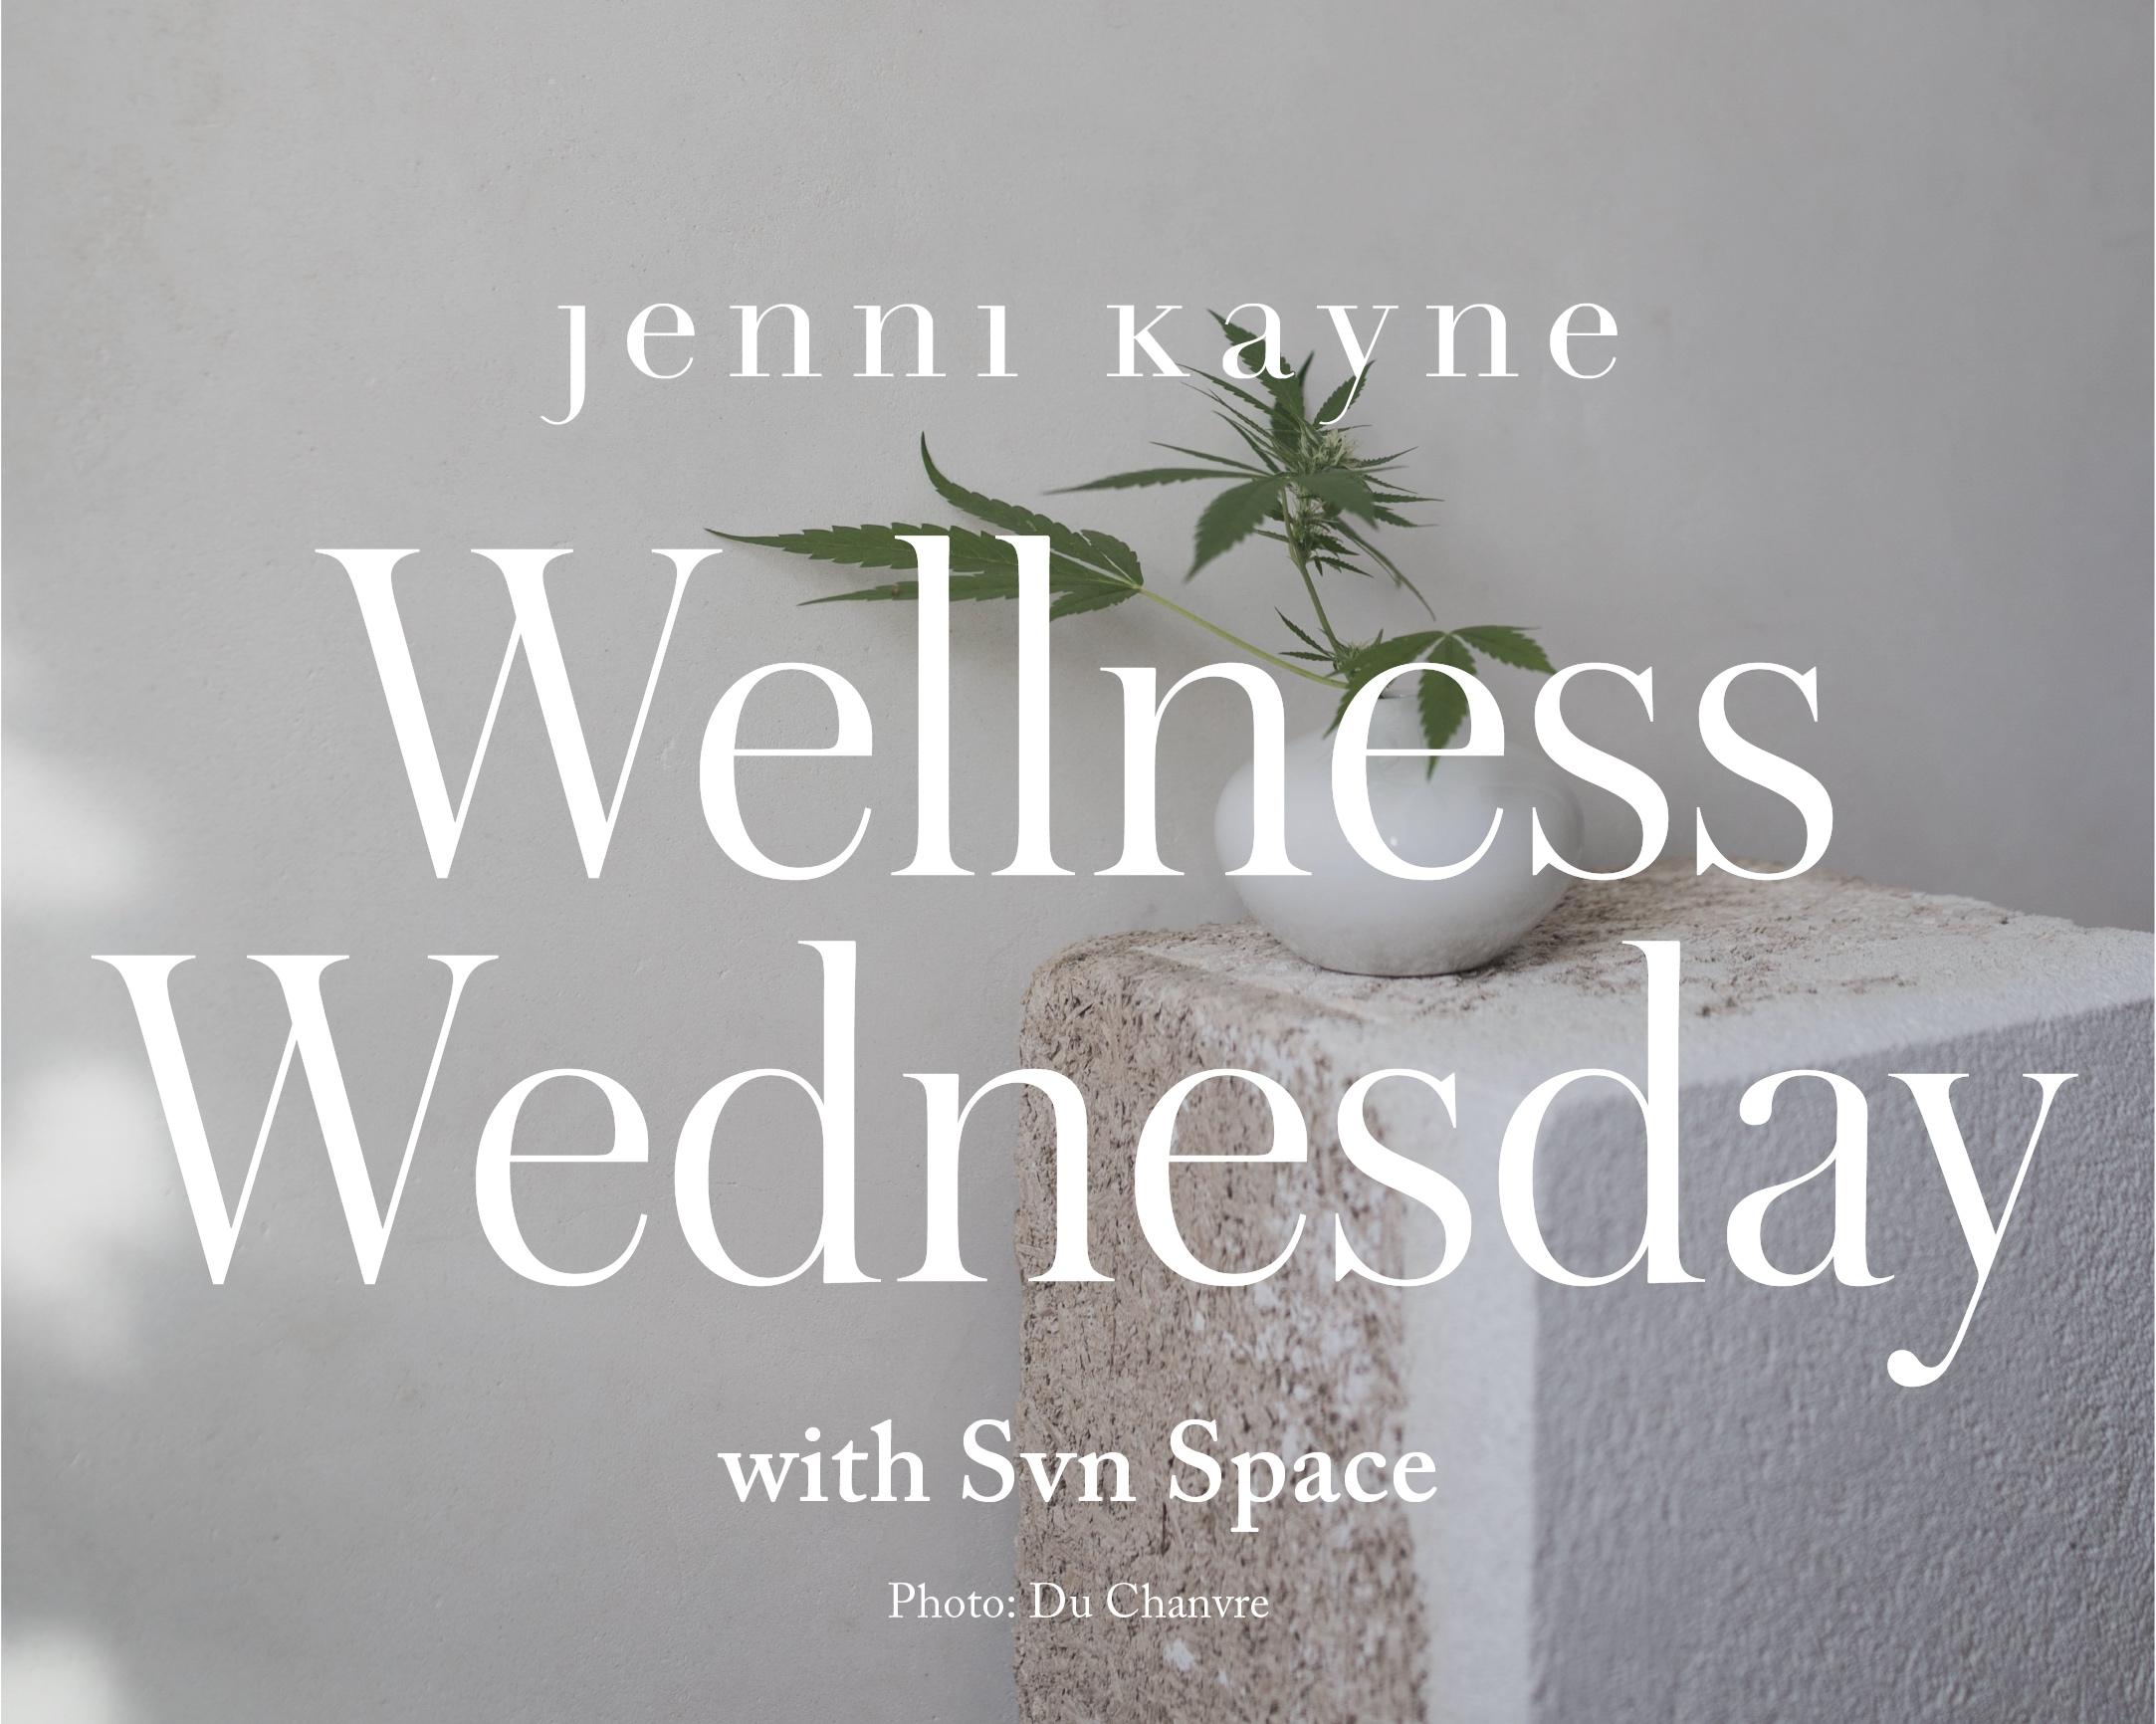 Jenni+Kayne+x+Svn+Space.jpg